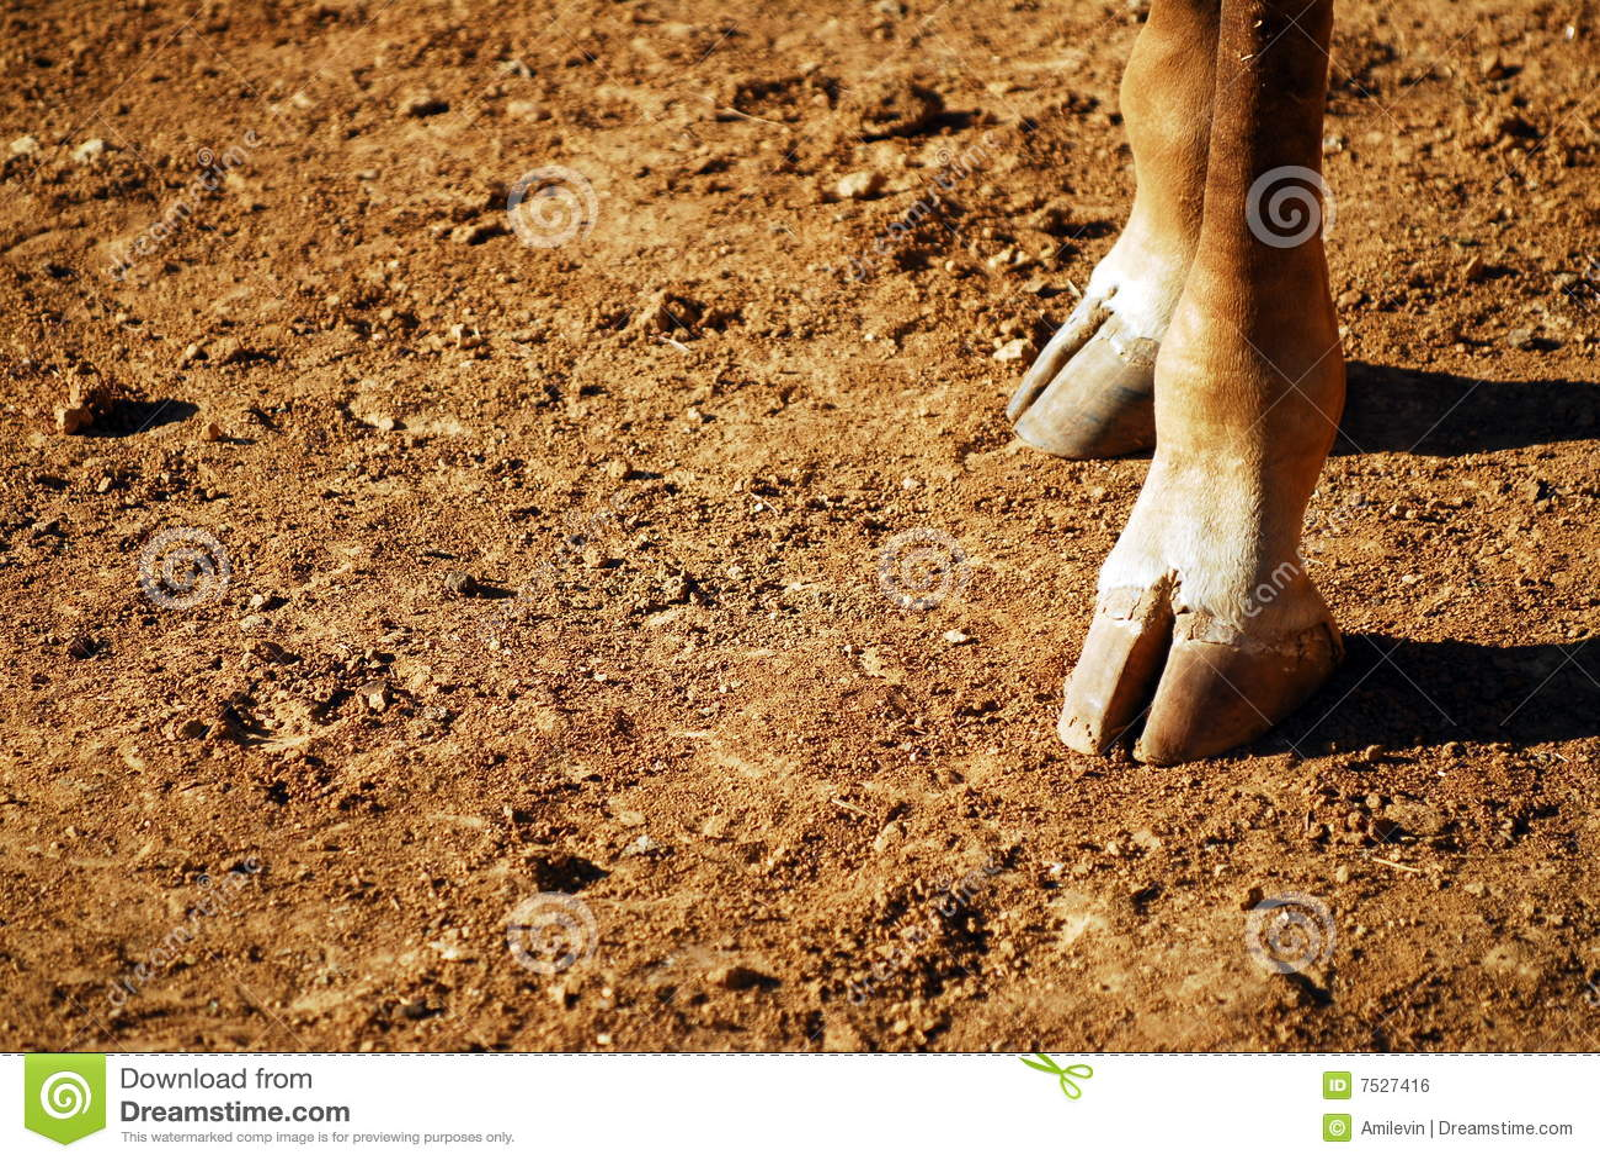 giraffe feet royalty free stock image